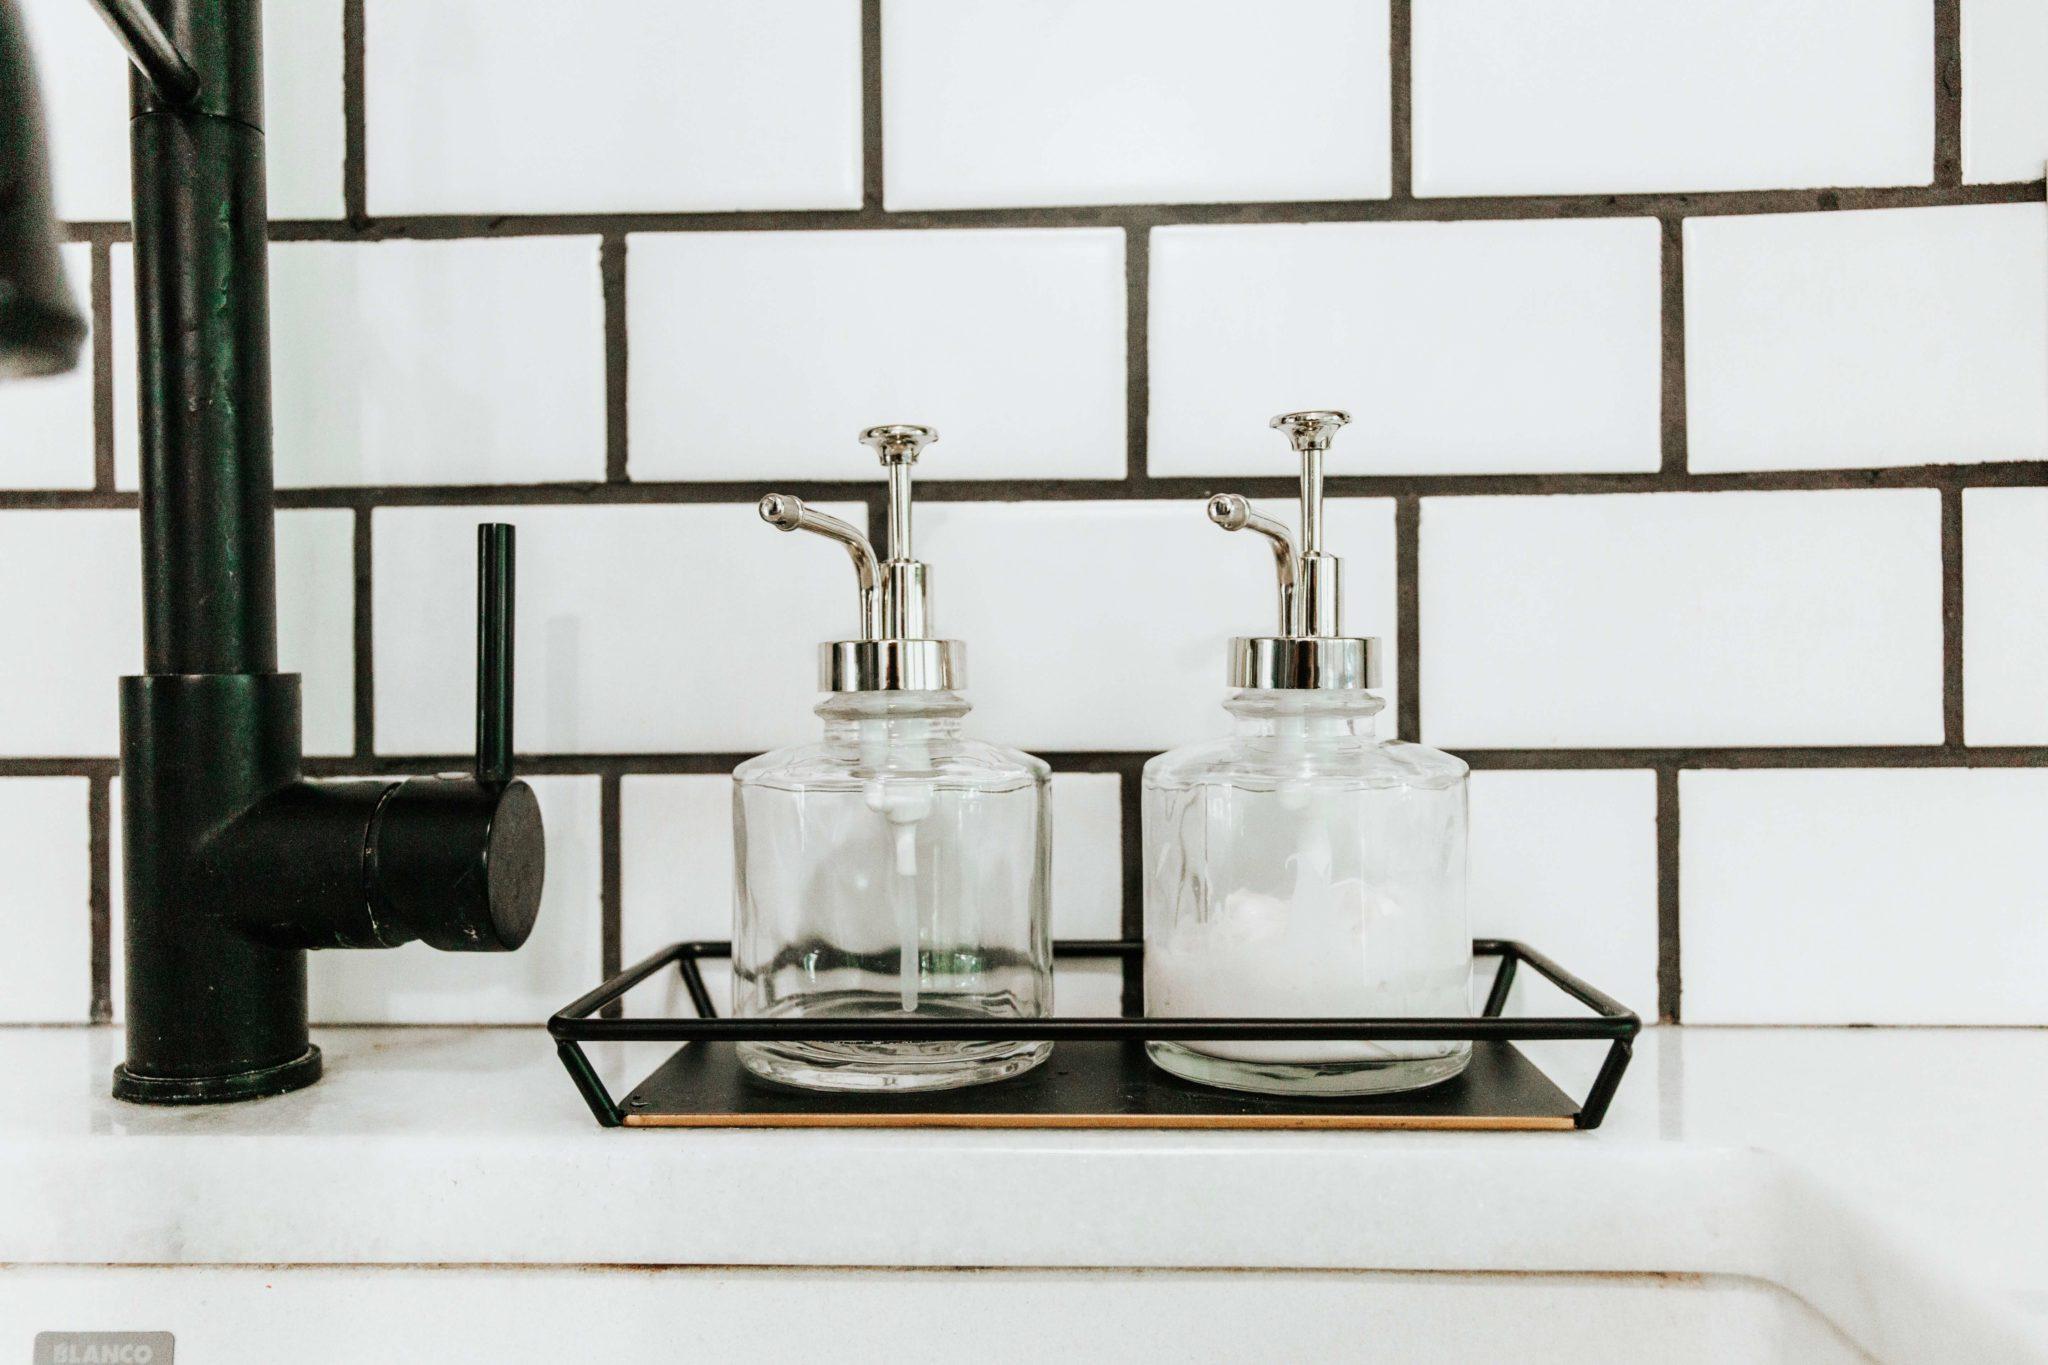 farmhouse kitchen soap dispensers